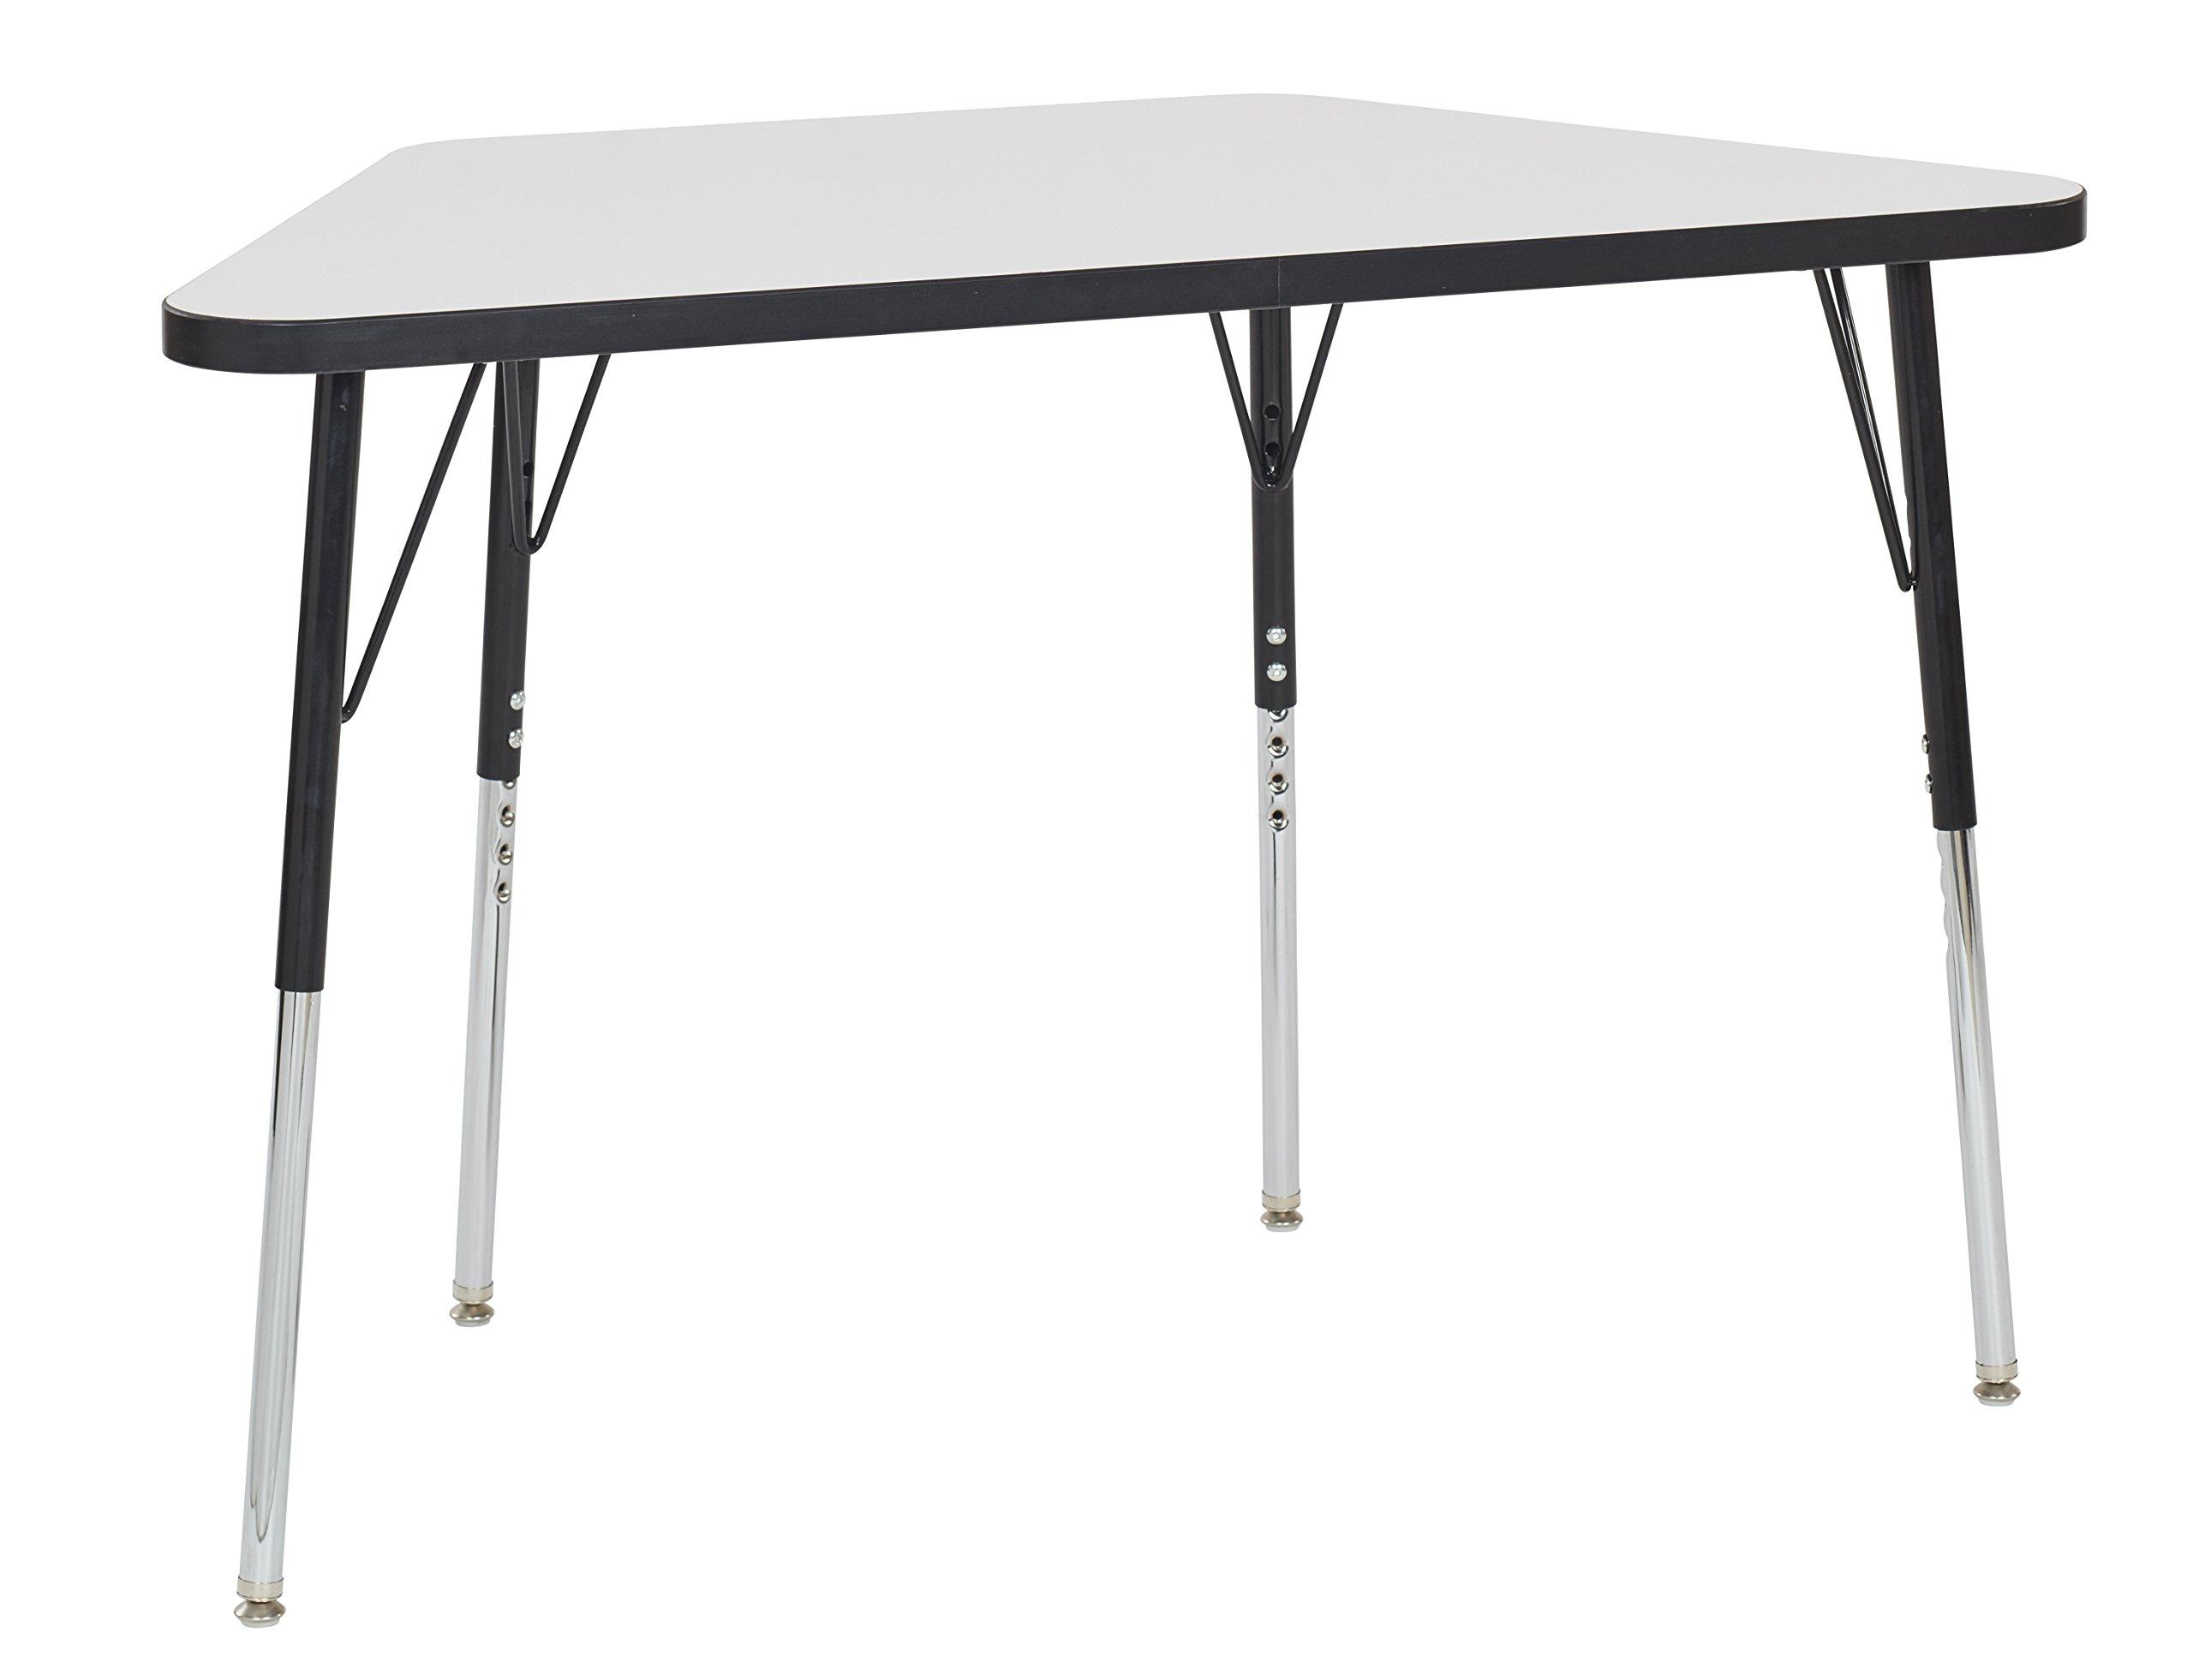 ECR4Kids Mesa Dry-Erase 24'' x 48'' Trapezoid School Activity Table, Standard Legs w/ Swivel Glides, Adjustable Height 19-30 inch (Black)